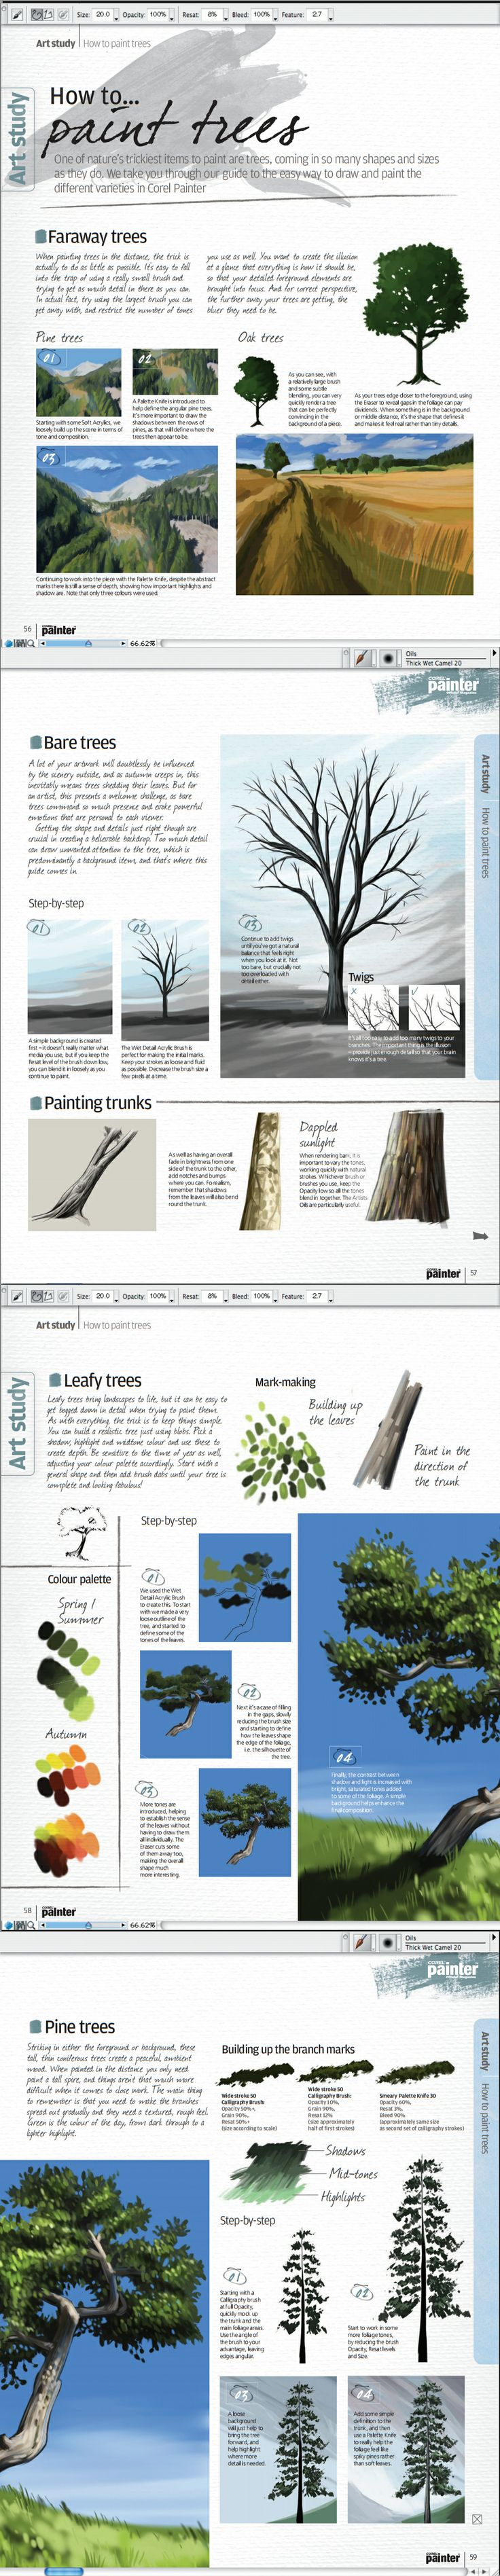 How to Paint Trees - Corel Painter Magazine